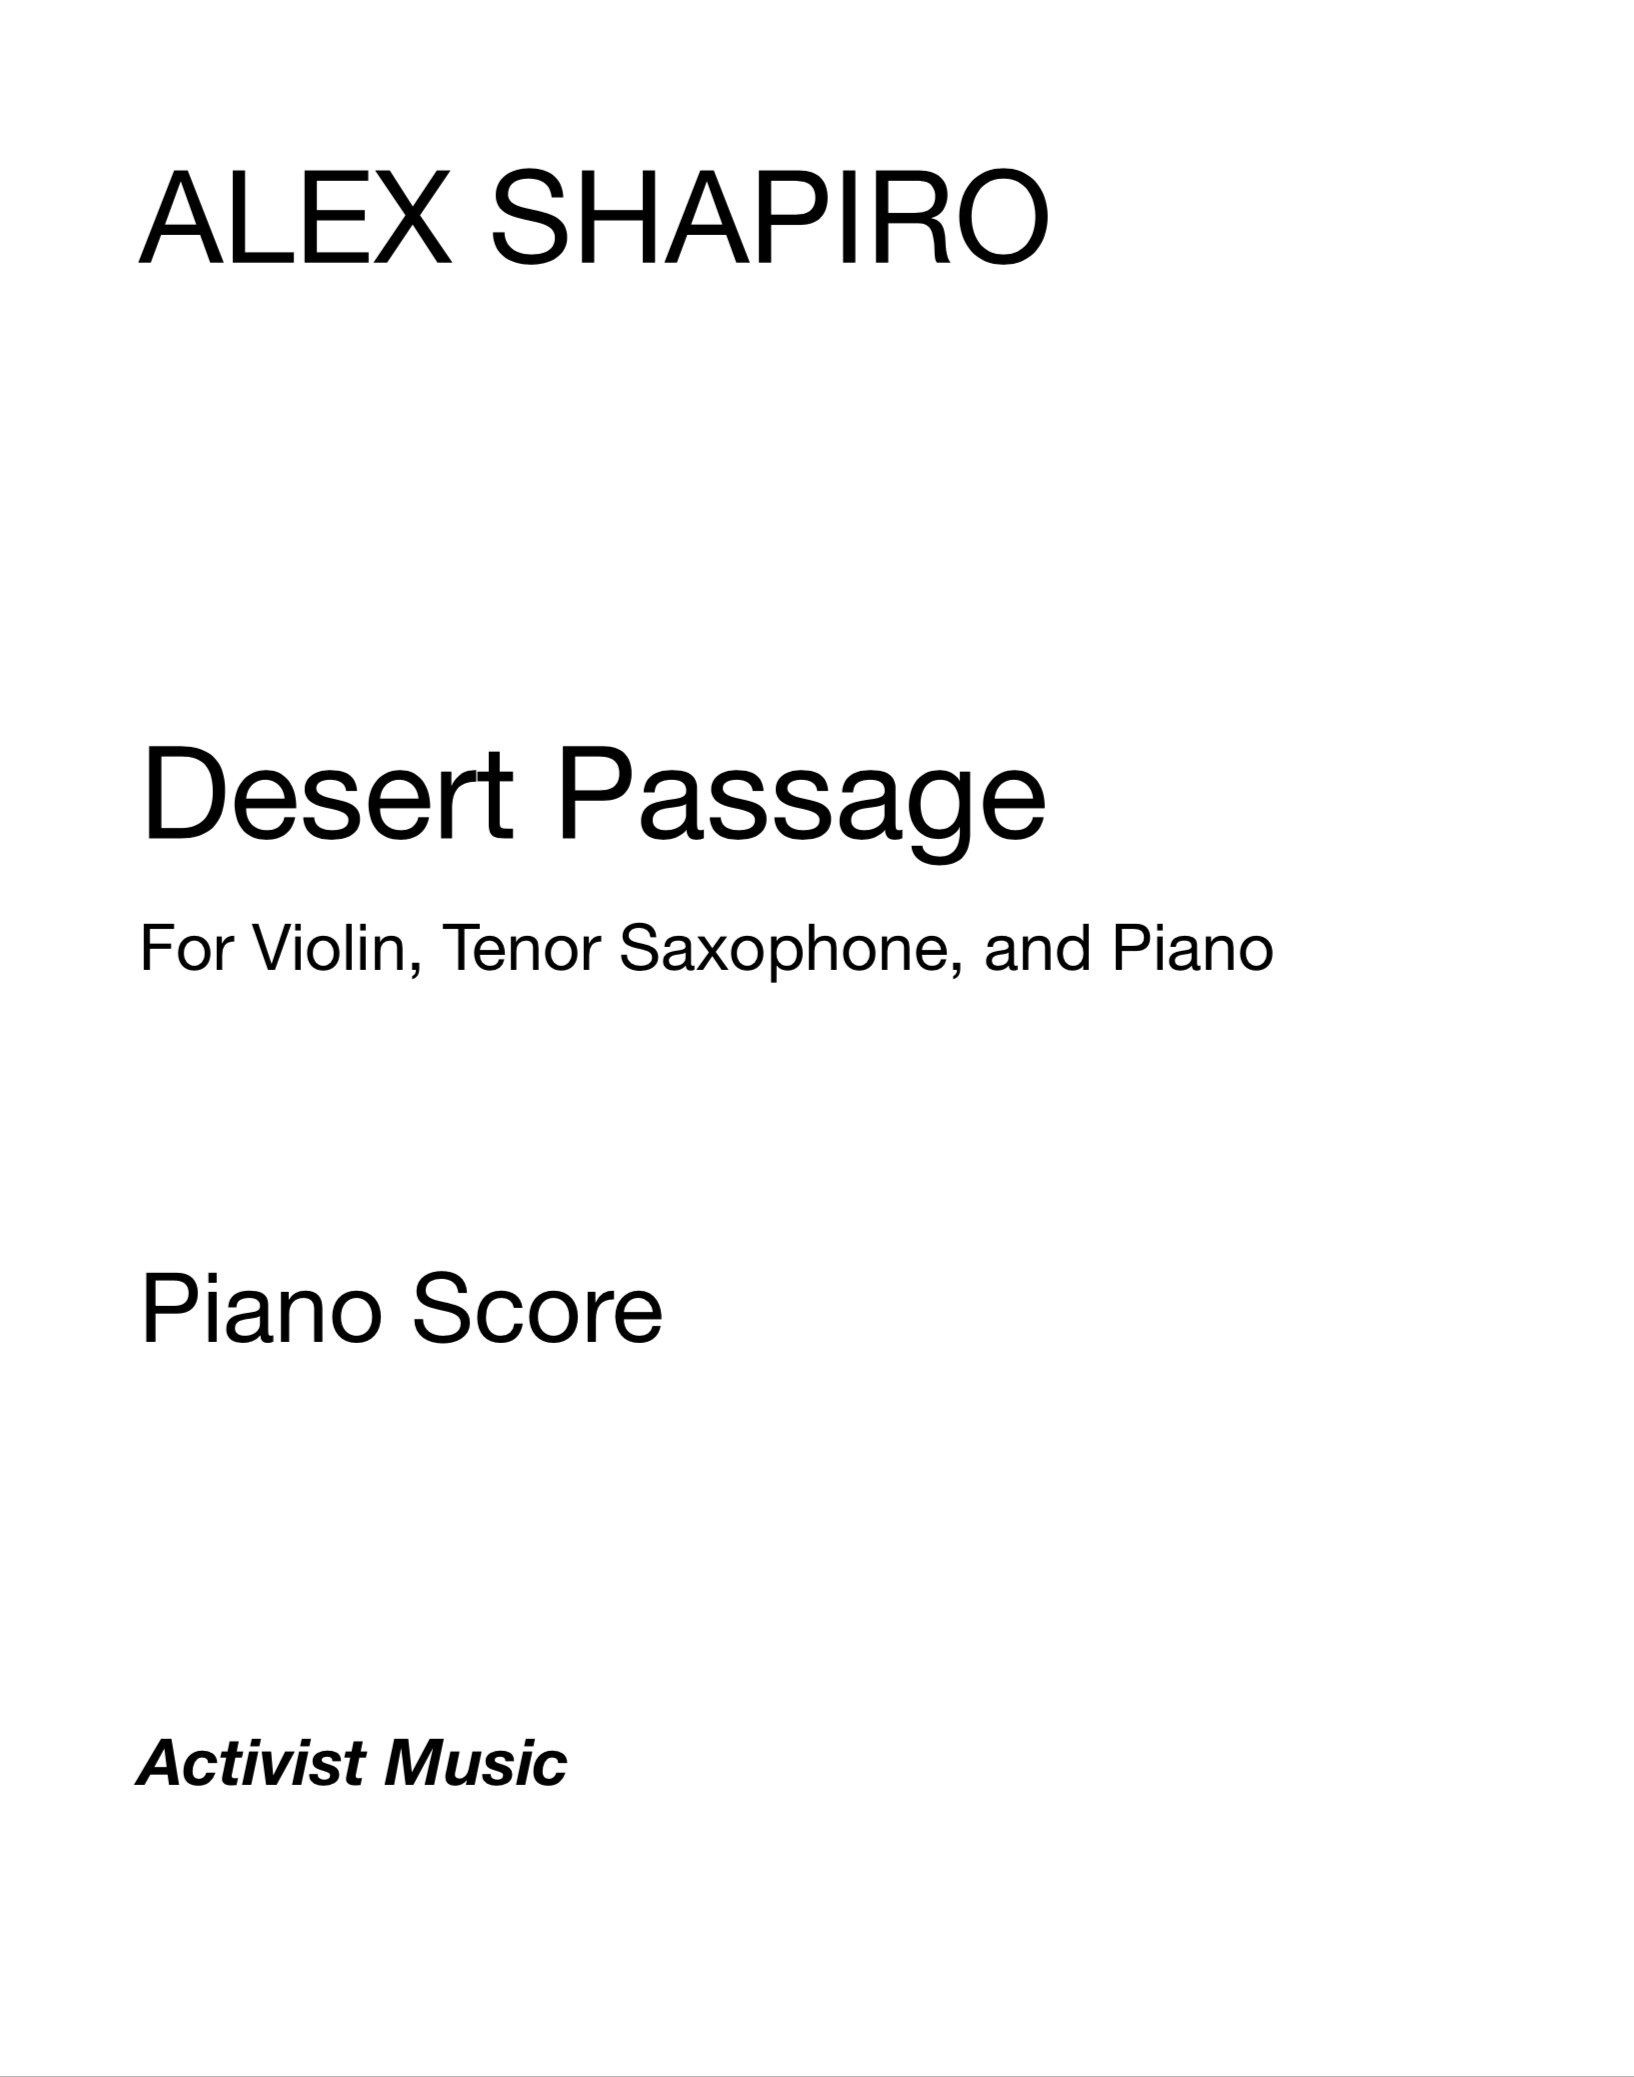 Desert Passage  by Alex Shapiro